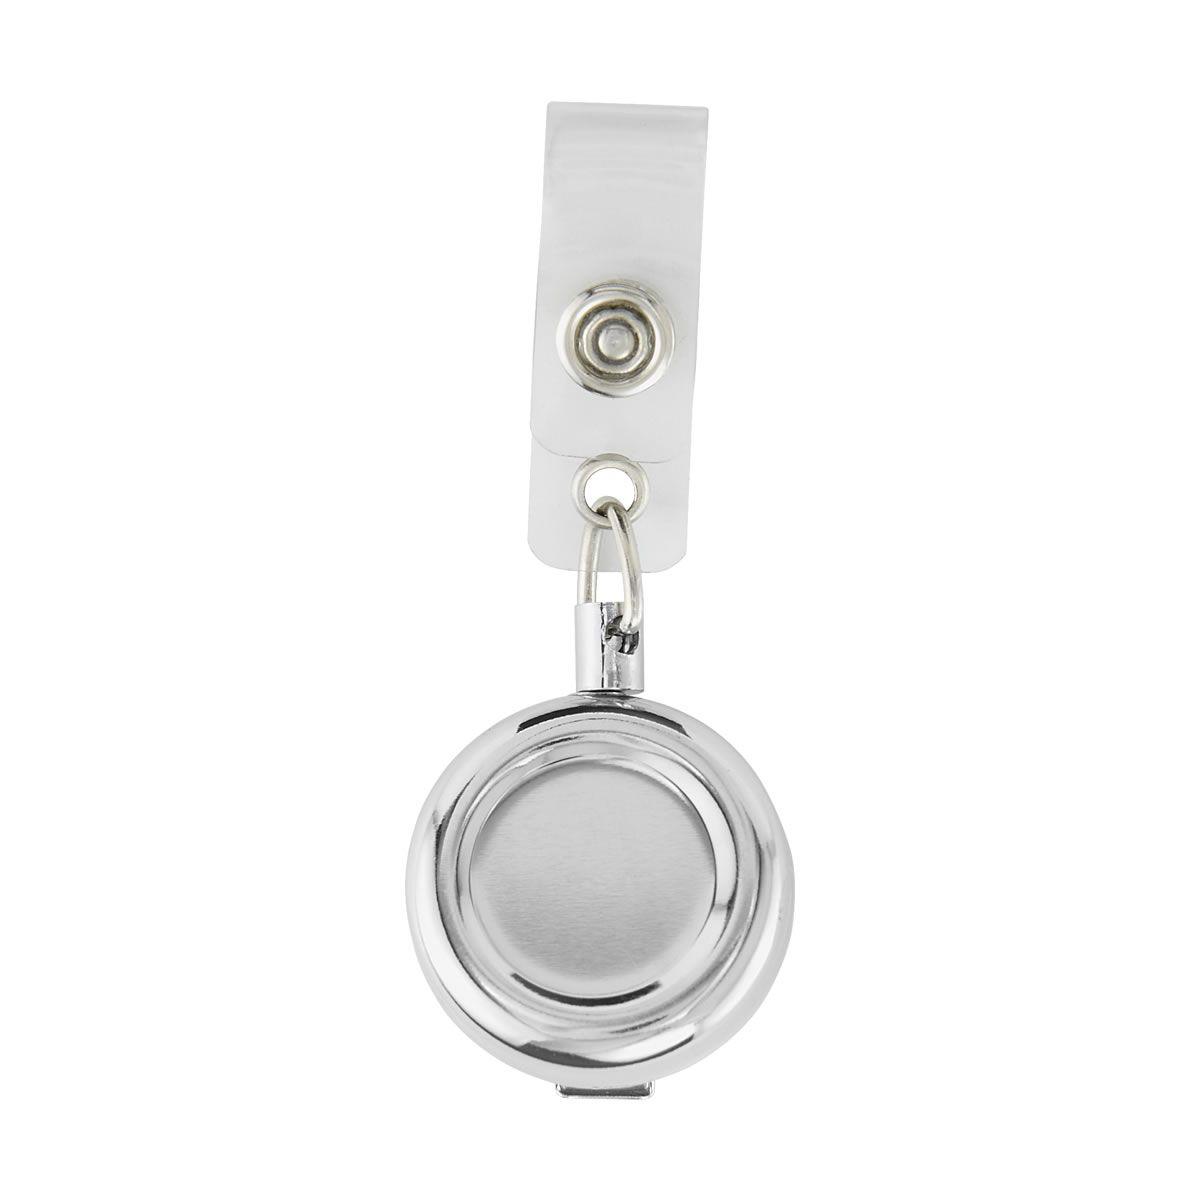 Portagafete metalico plata AP-002